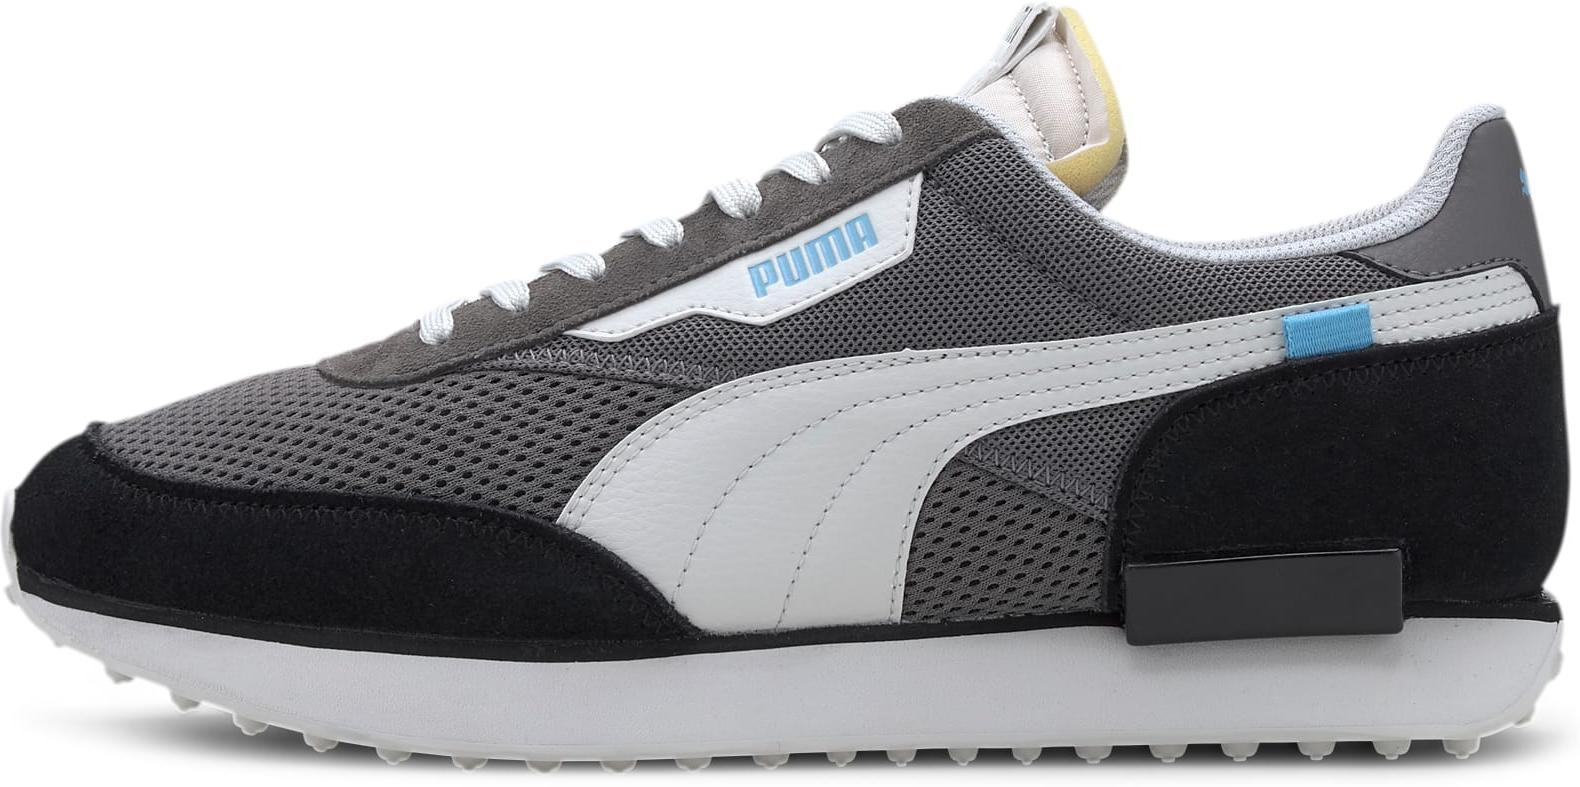 Schuhe Puma FUTURE RIDER STREAM ON